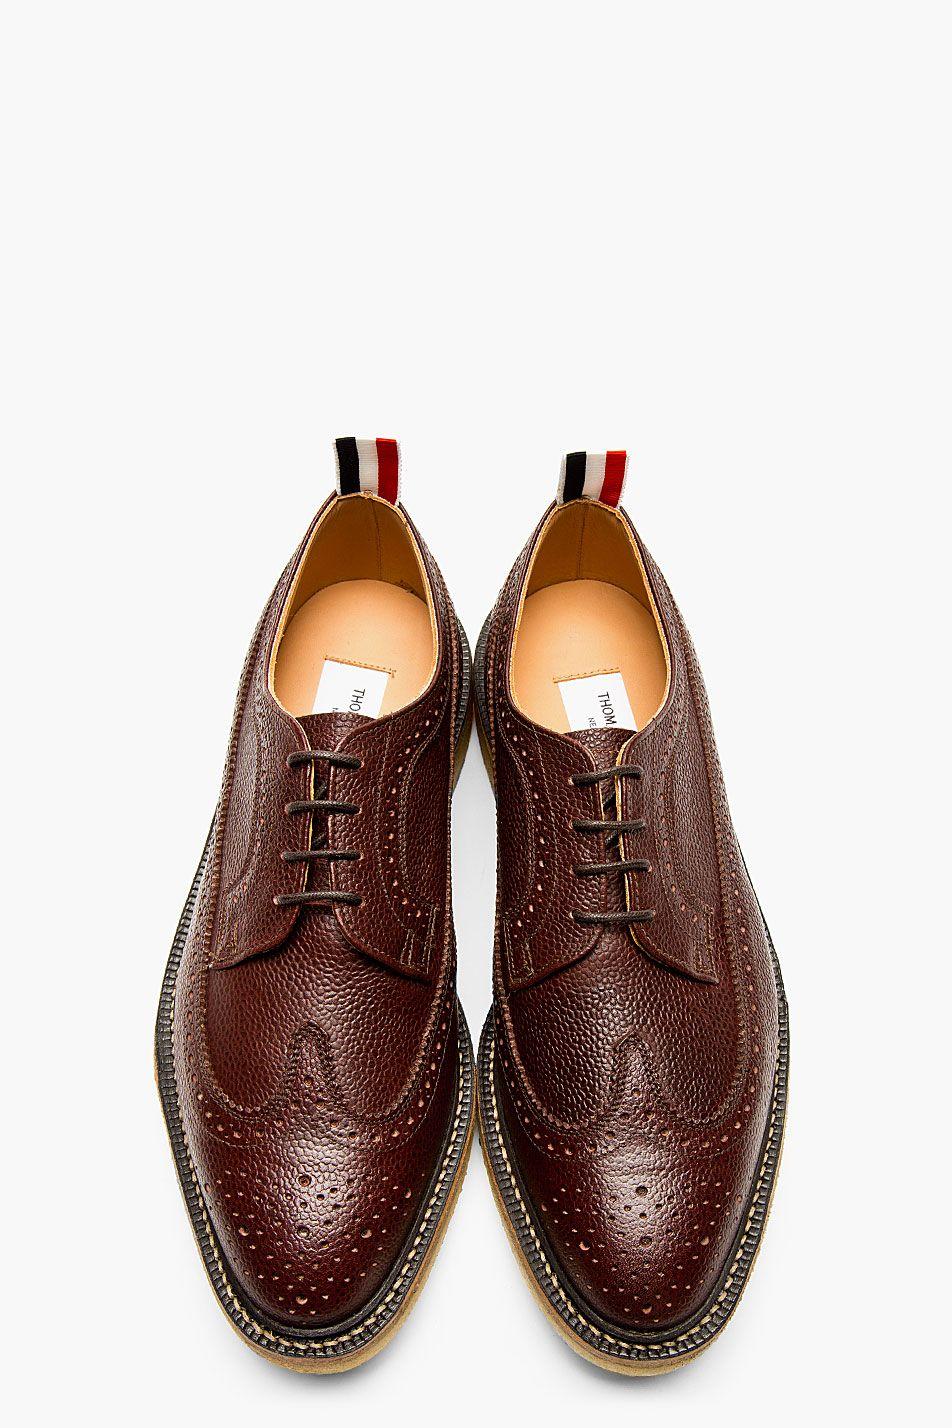 eaba2c4a9ee THOM BROWNE Maroon Leather Longwing Brogues. THOM BROWNE Maroon Leather  Longwing Brogues Gentleman Shoes